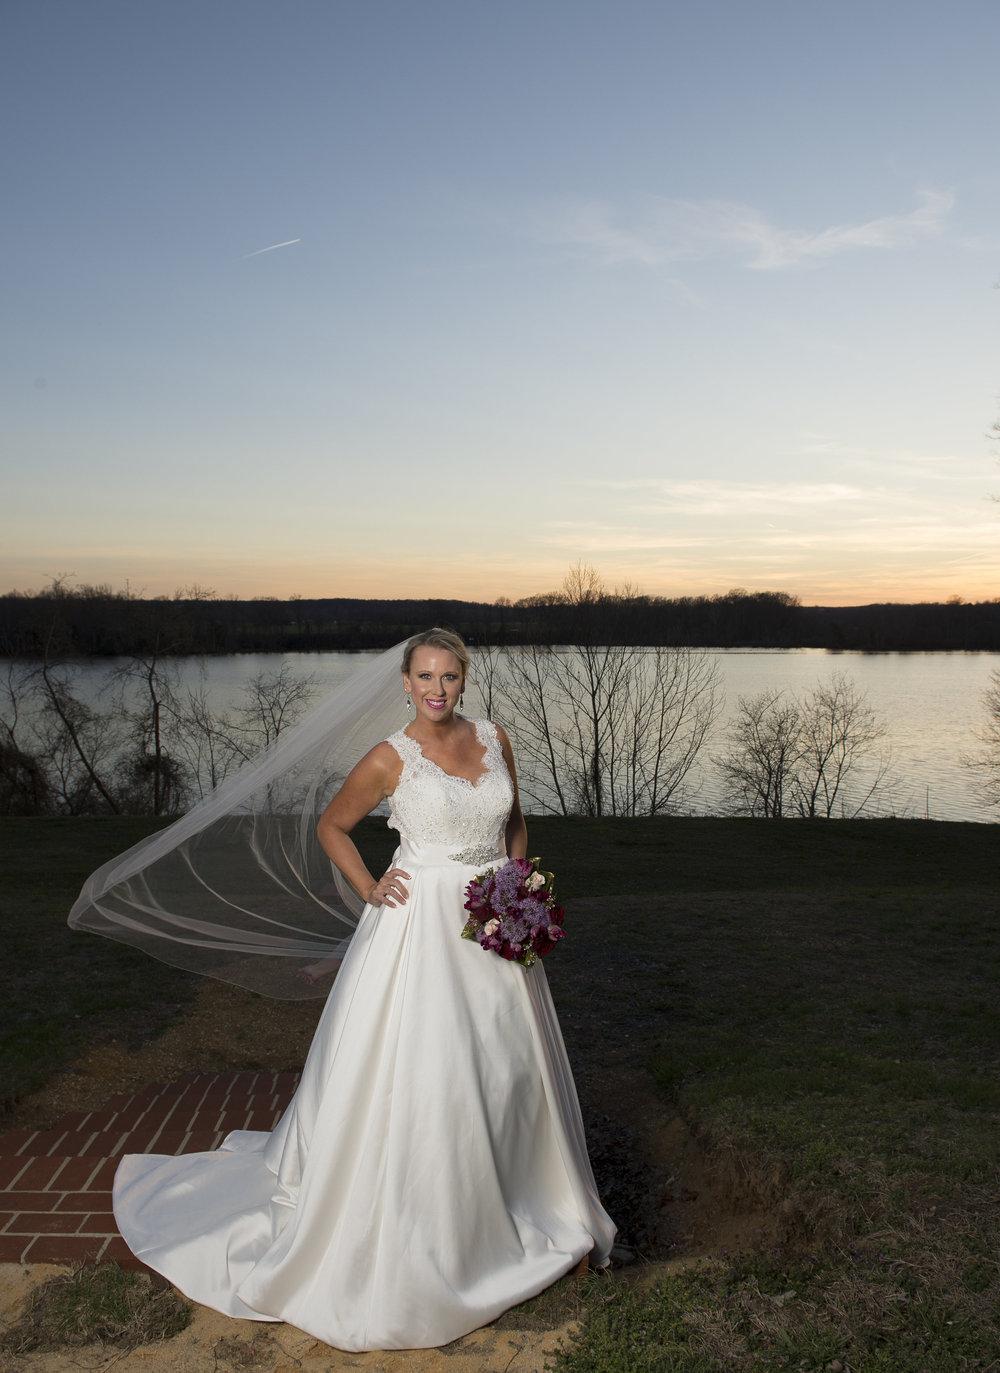 Brides and Weddings Shoot-belle grove style-0272.jpg